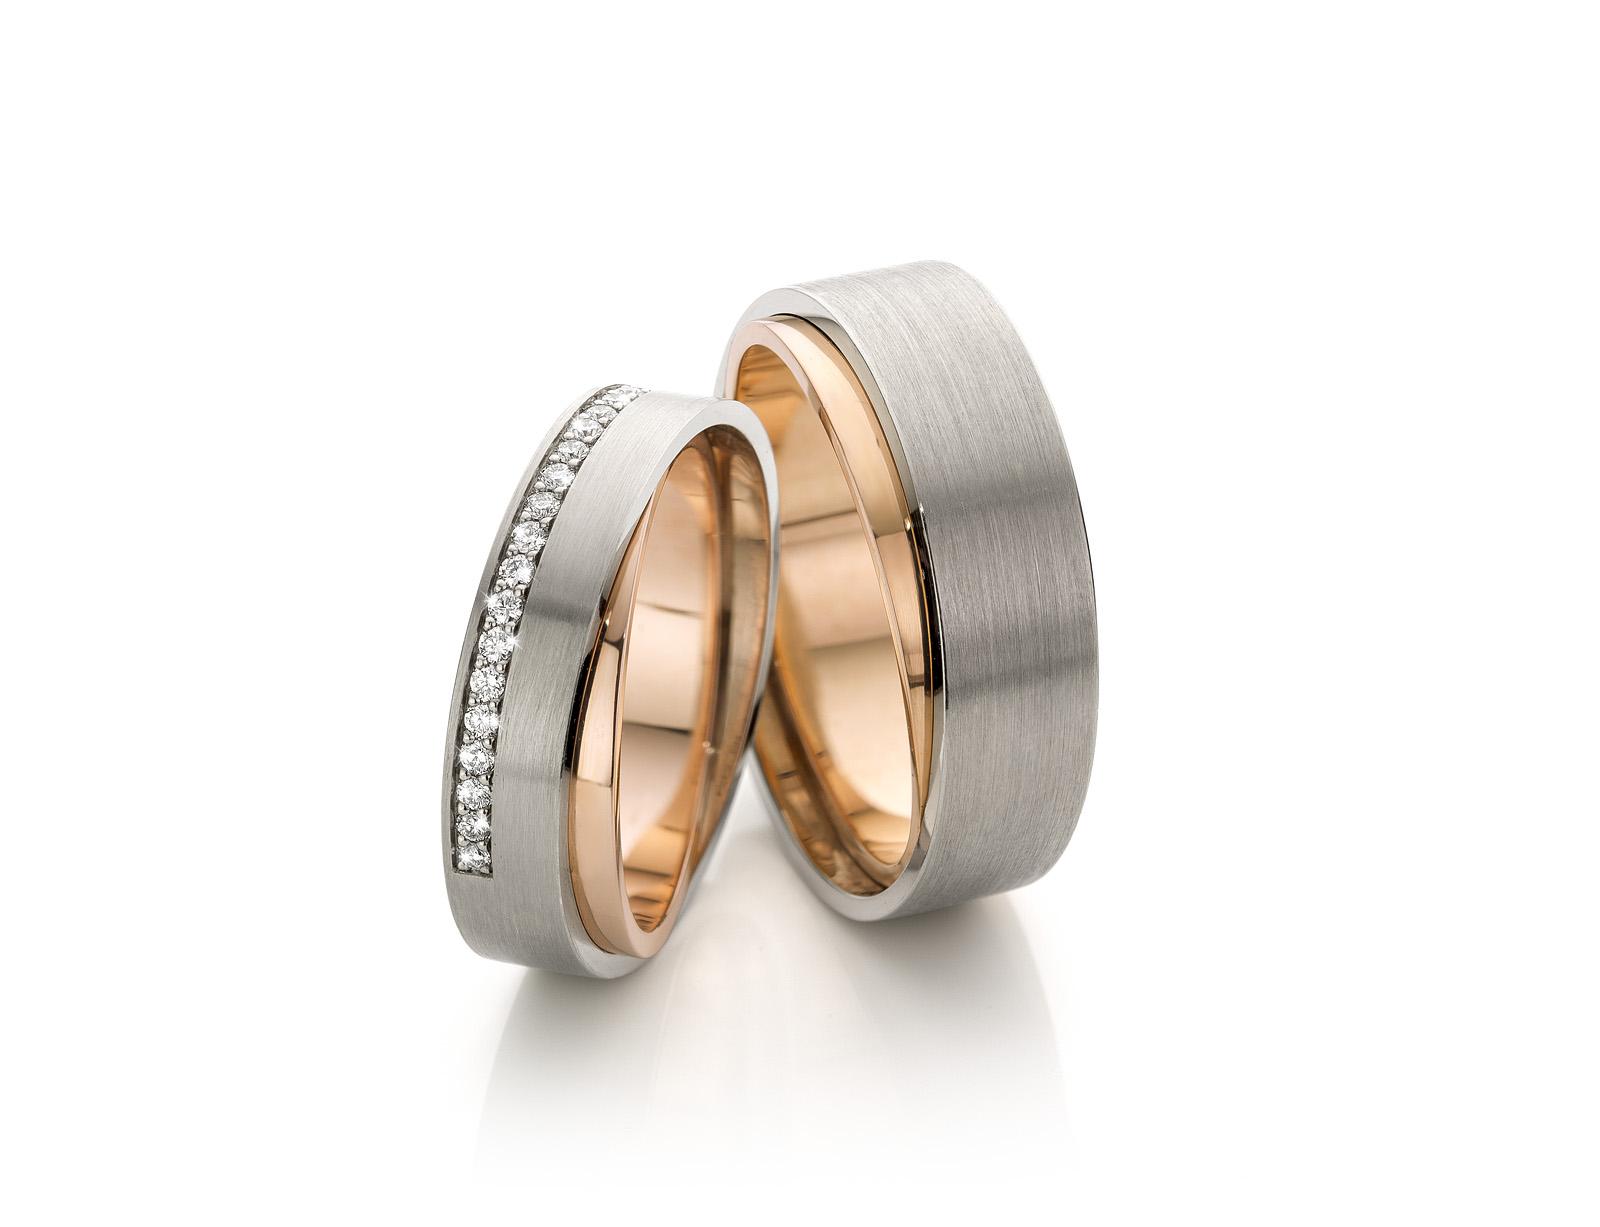 Whitegold and rosegold 14k wedding rings Handmade in the Netherlands